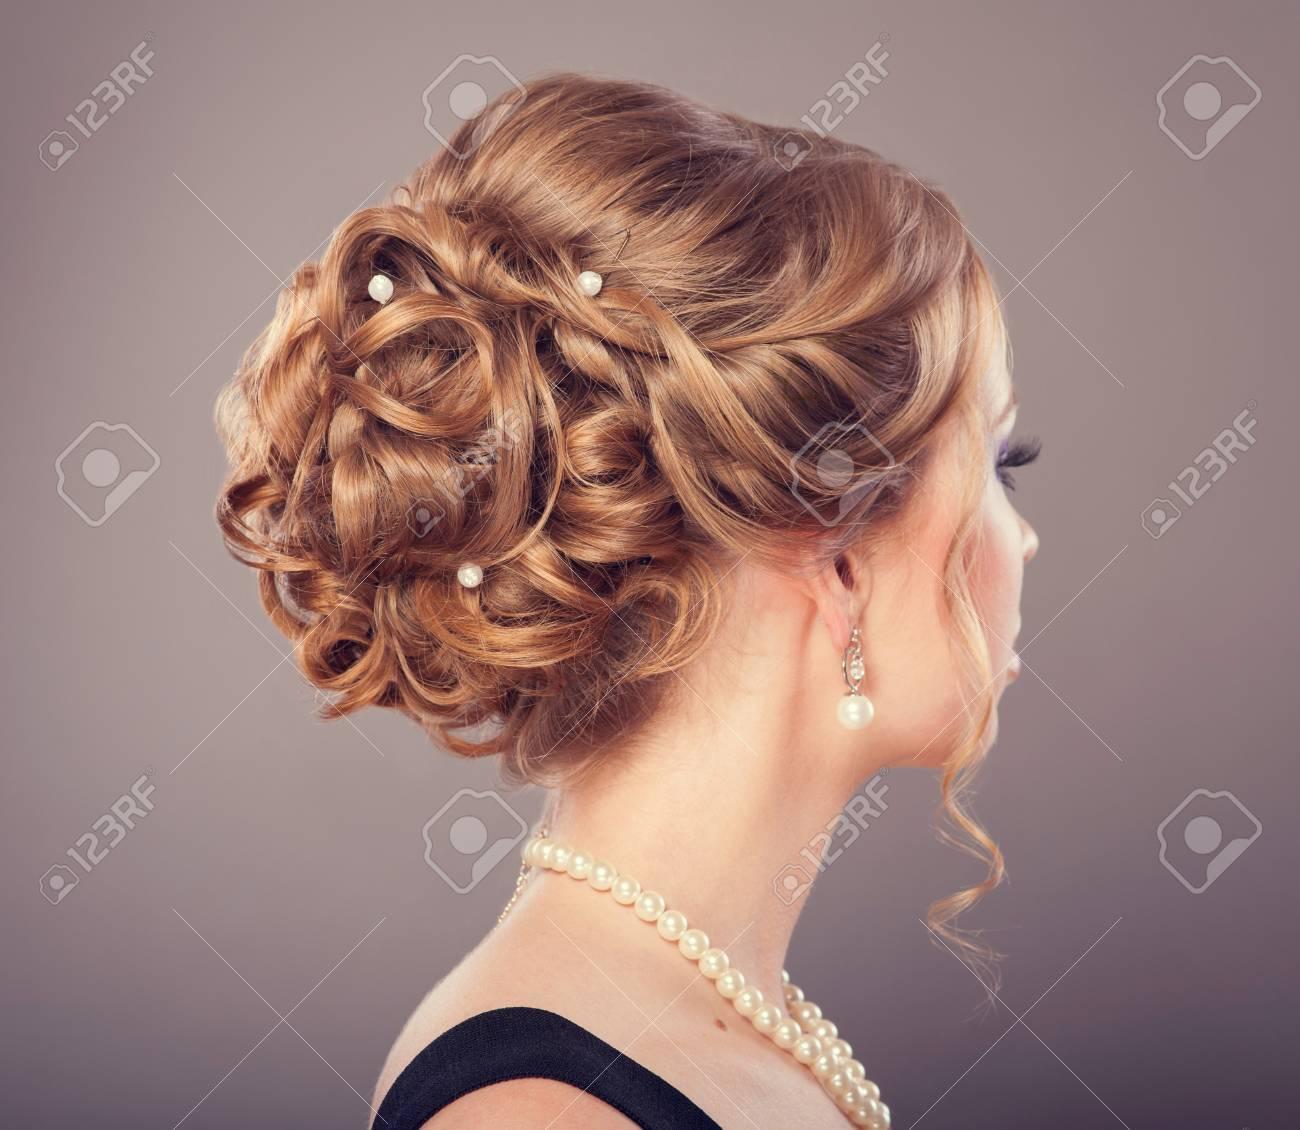 Hairstyle Stock Photo - 30532562